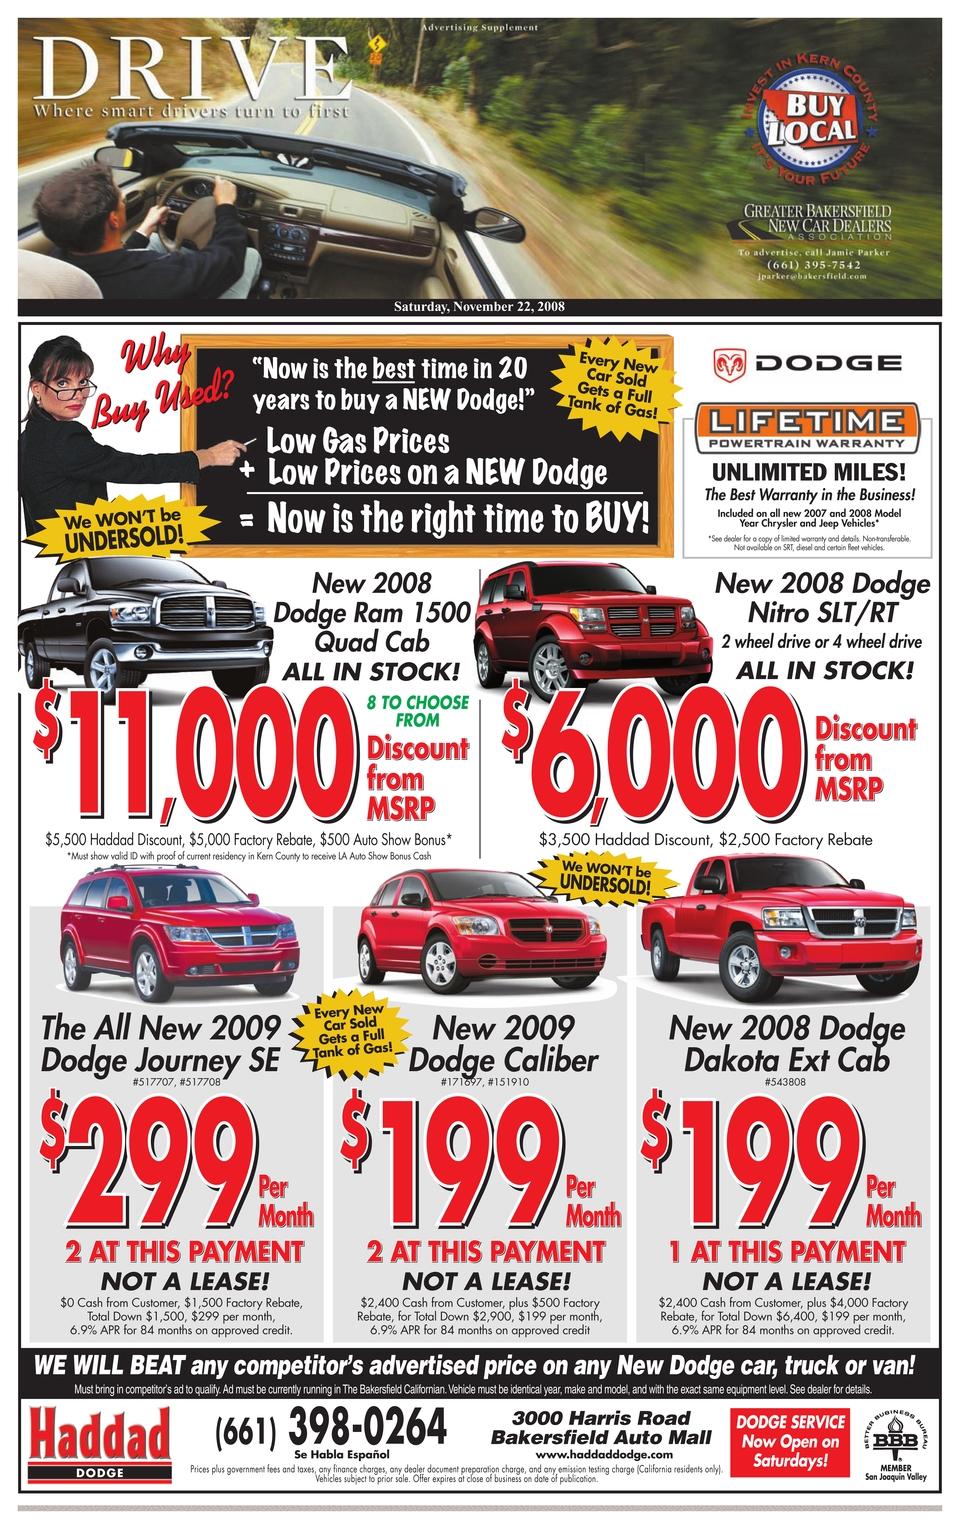 Dodge Dealership Bakersfield : dodge, dealership, bakersfield, Drive, 11-22-08